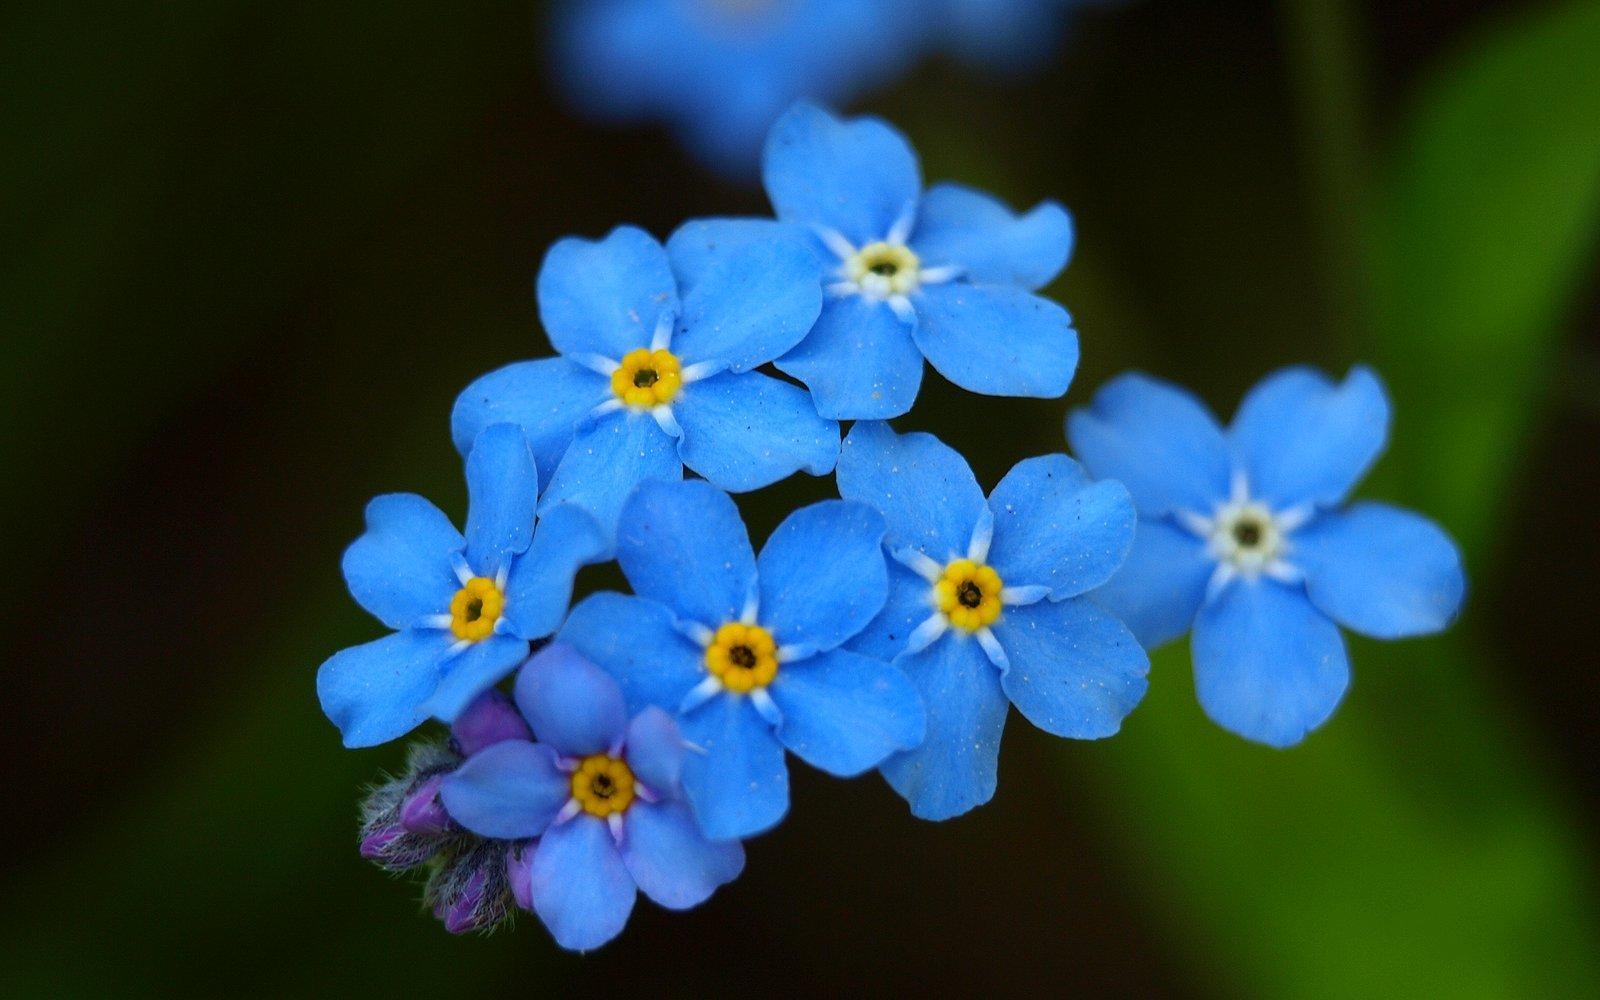 Цветы с синими цветами : названия, описание, фото 48